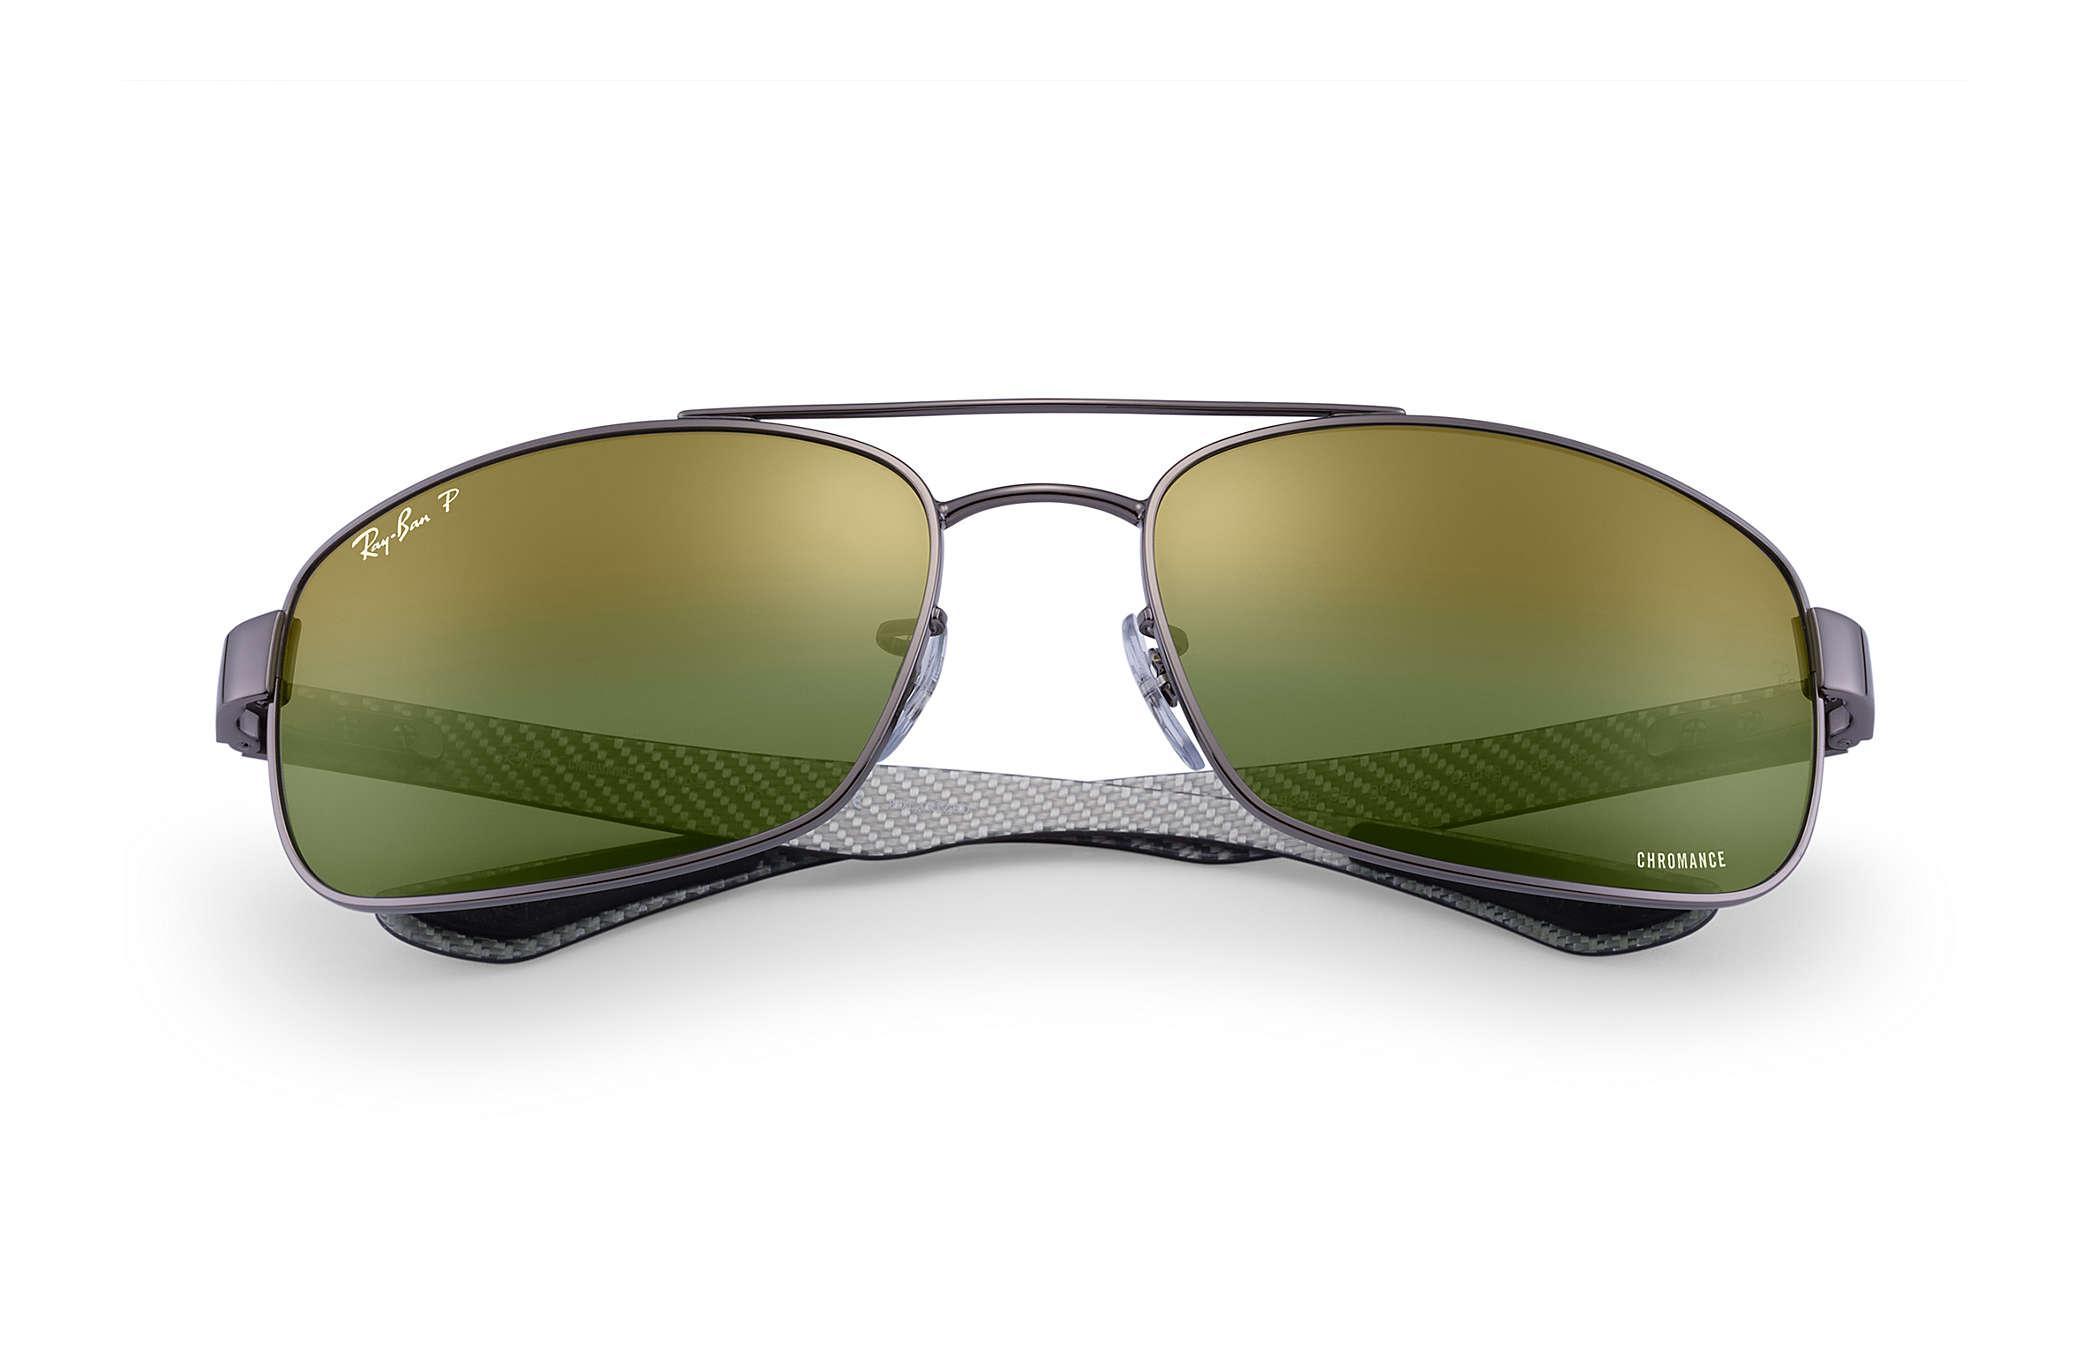 b16764c83f9 Ray-Ban - Green Rb8318 Chromance for Men - Lyst. View fullscreen